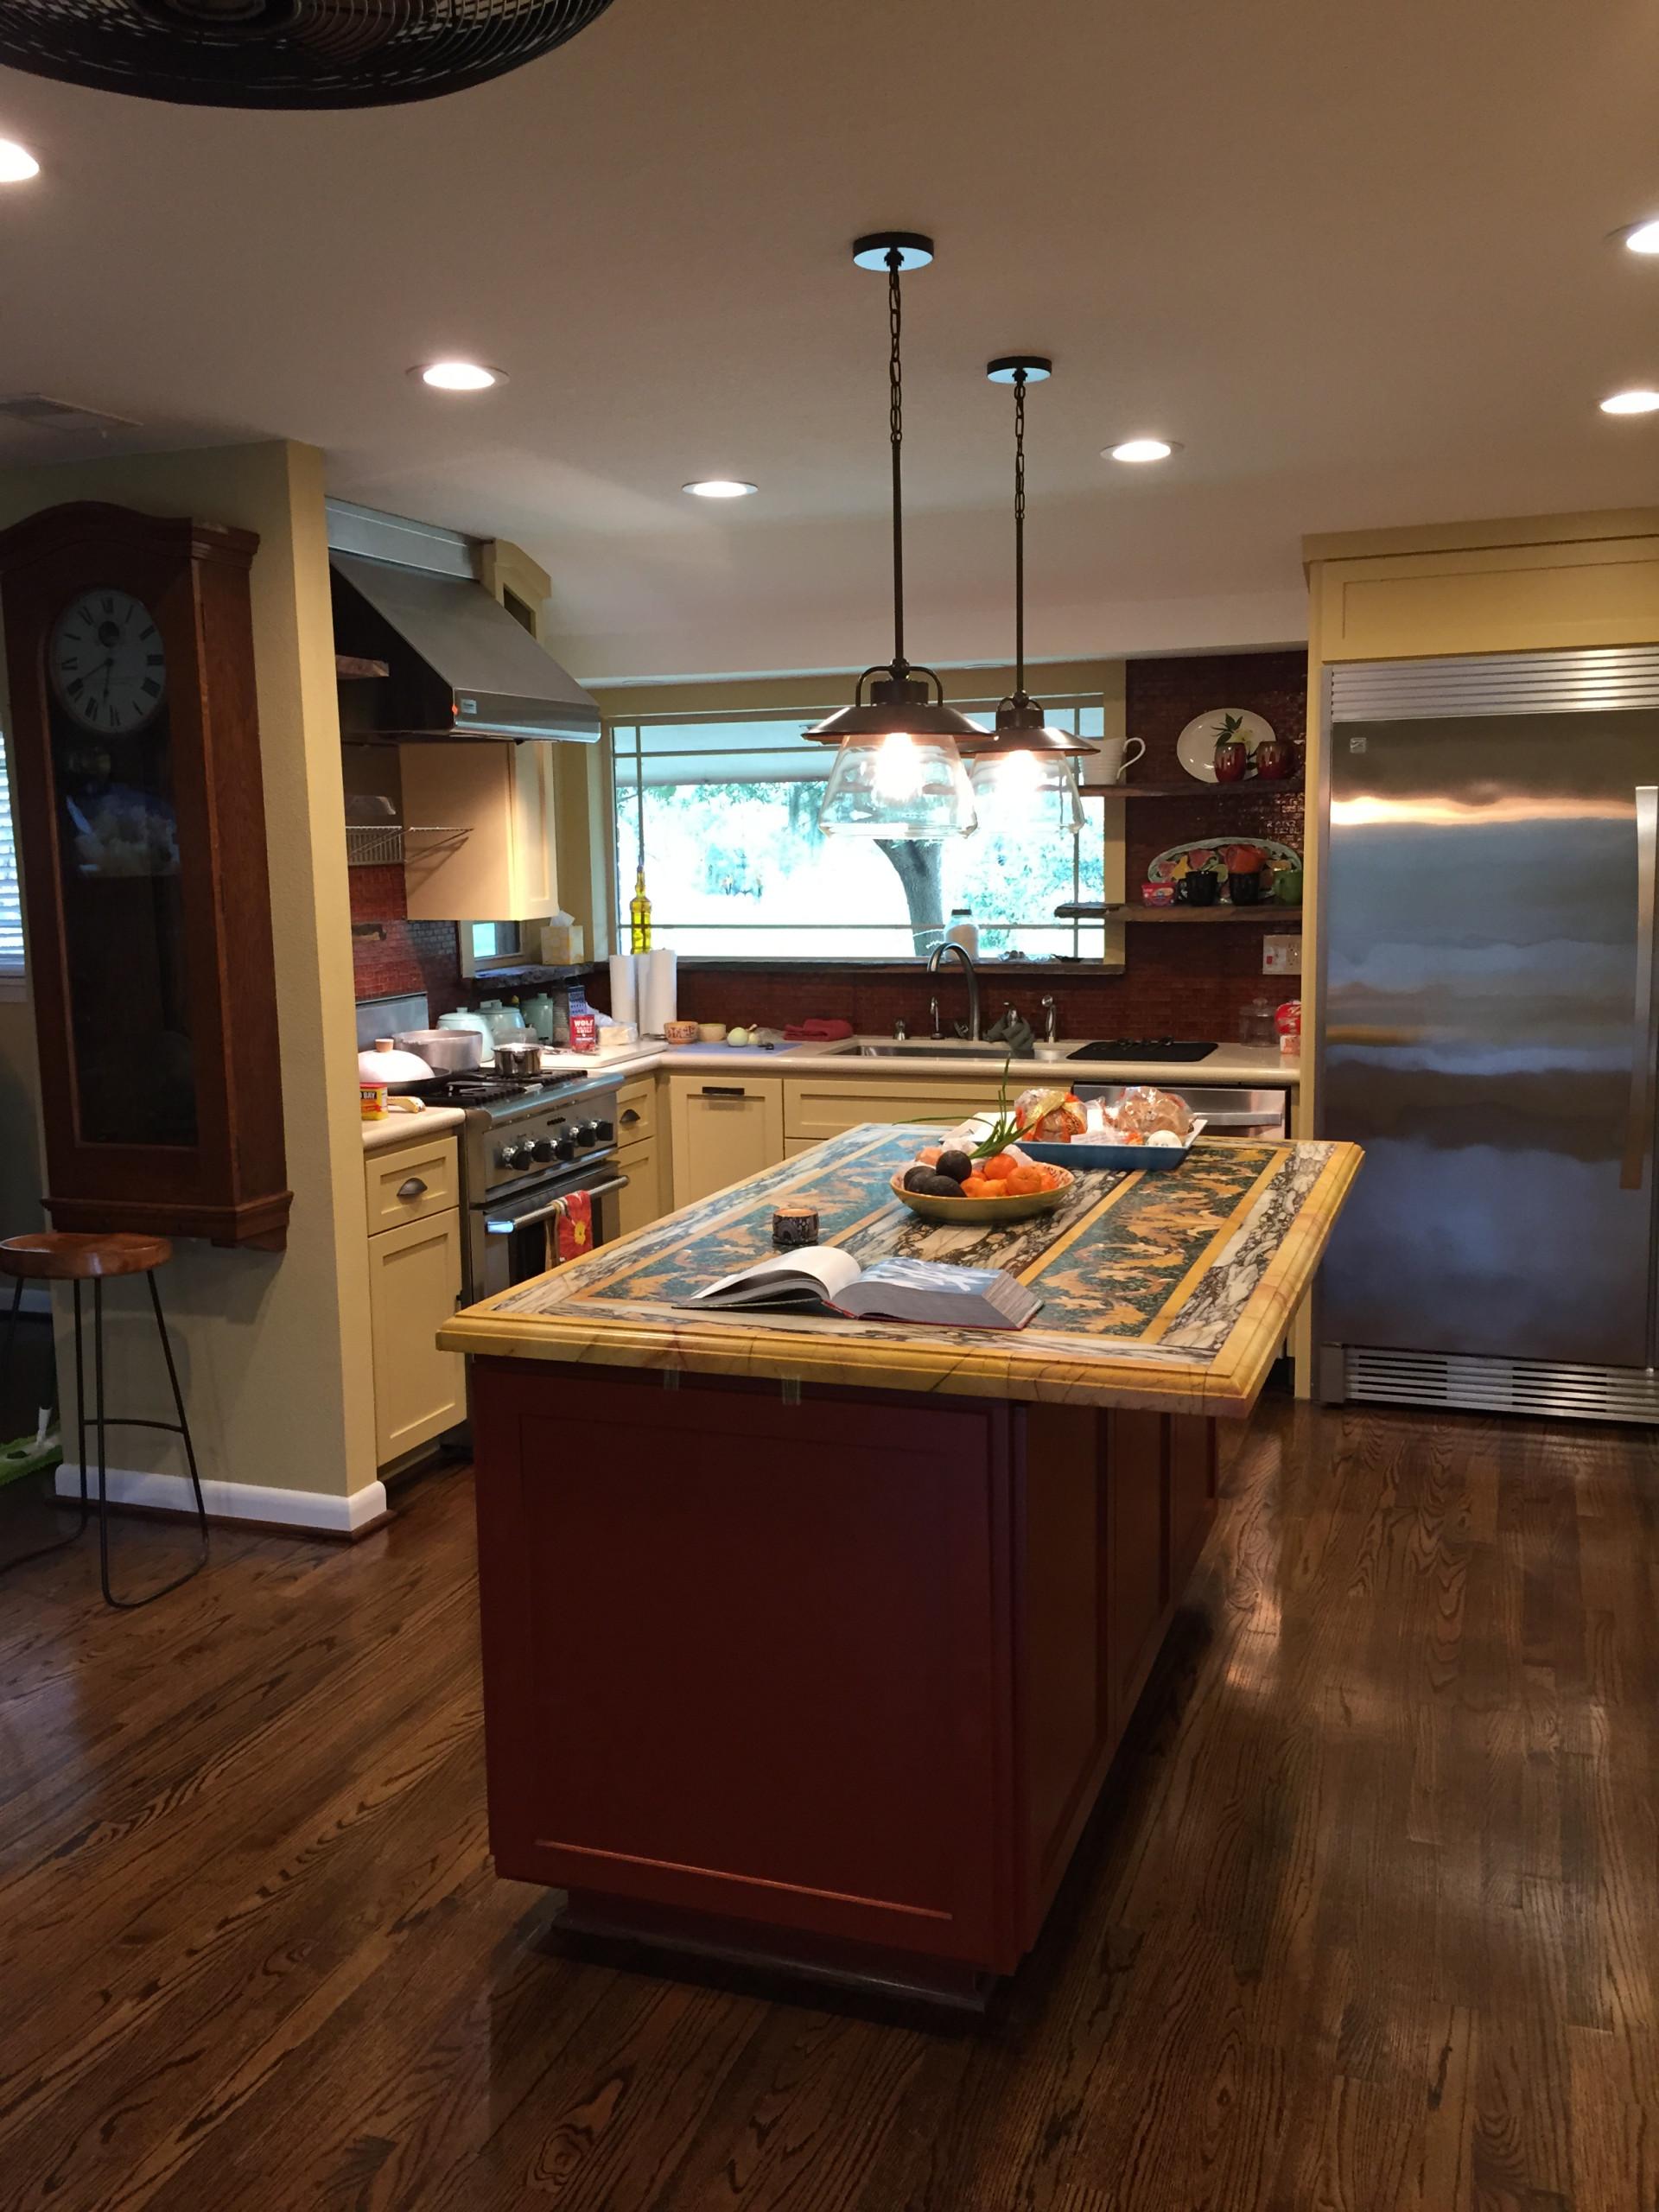 Hand Lane - Lake Jackson - Kitchen Remodel